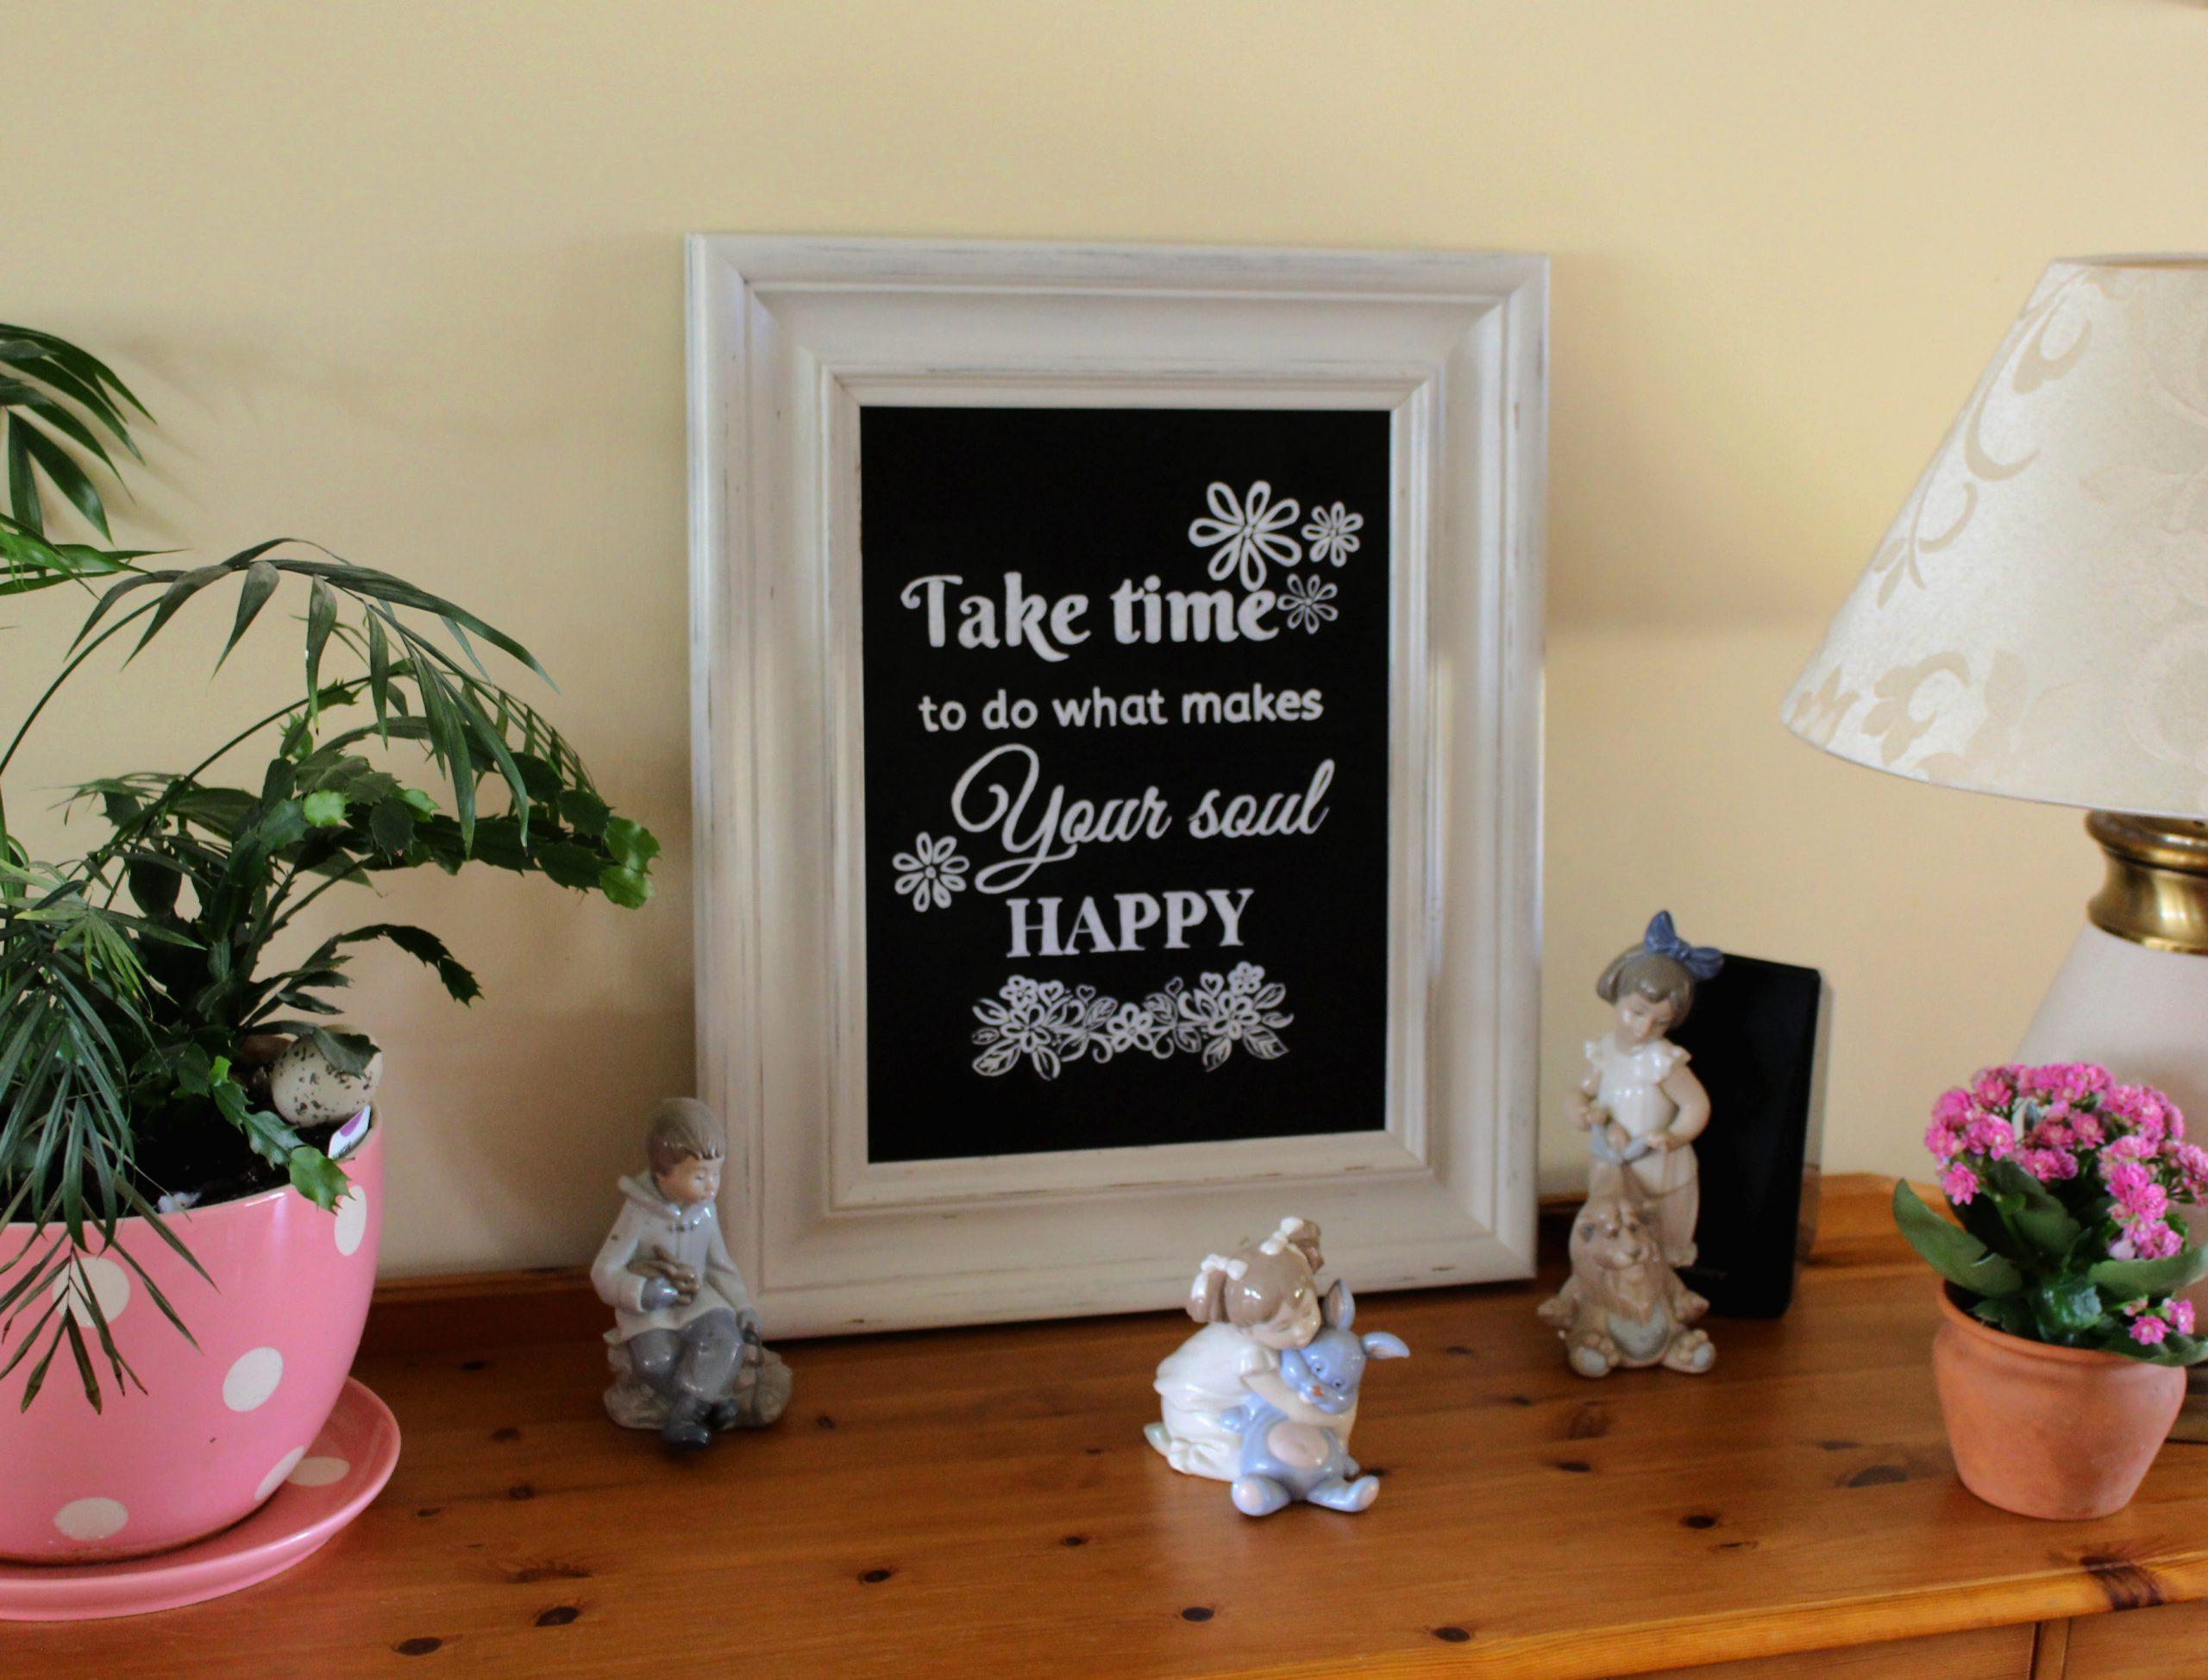 Transform a pine mirror frame to a chalkboard display